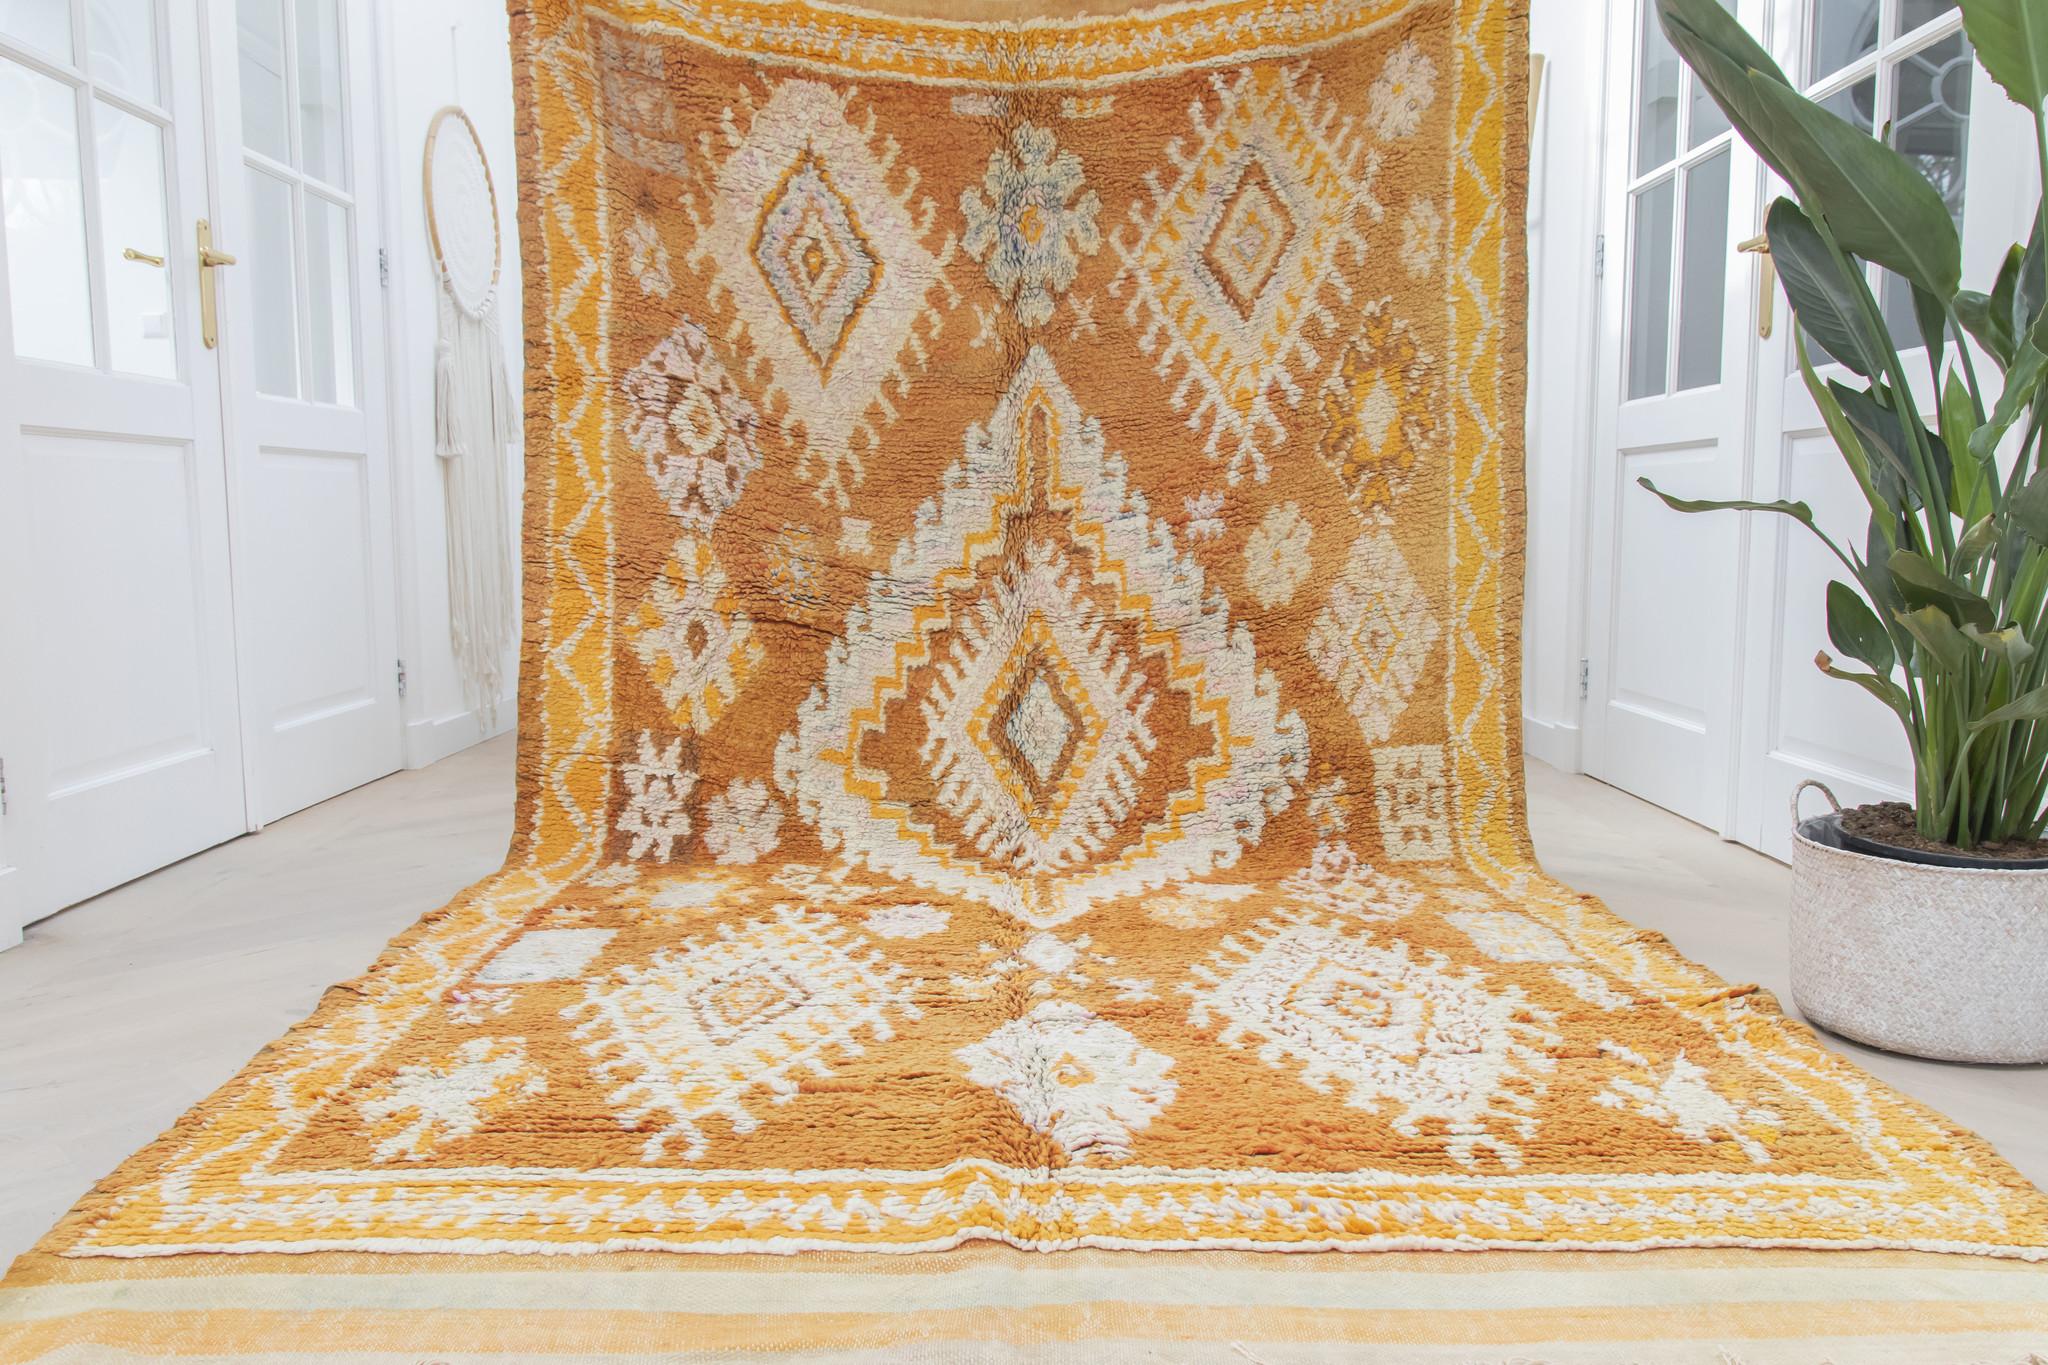 Simply Pure Handgefertigter Vintage Boujaad Berberteppich aus Marokko 177 x 337 cm